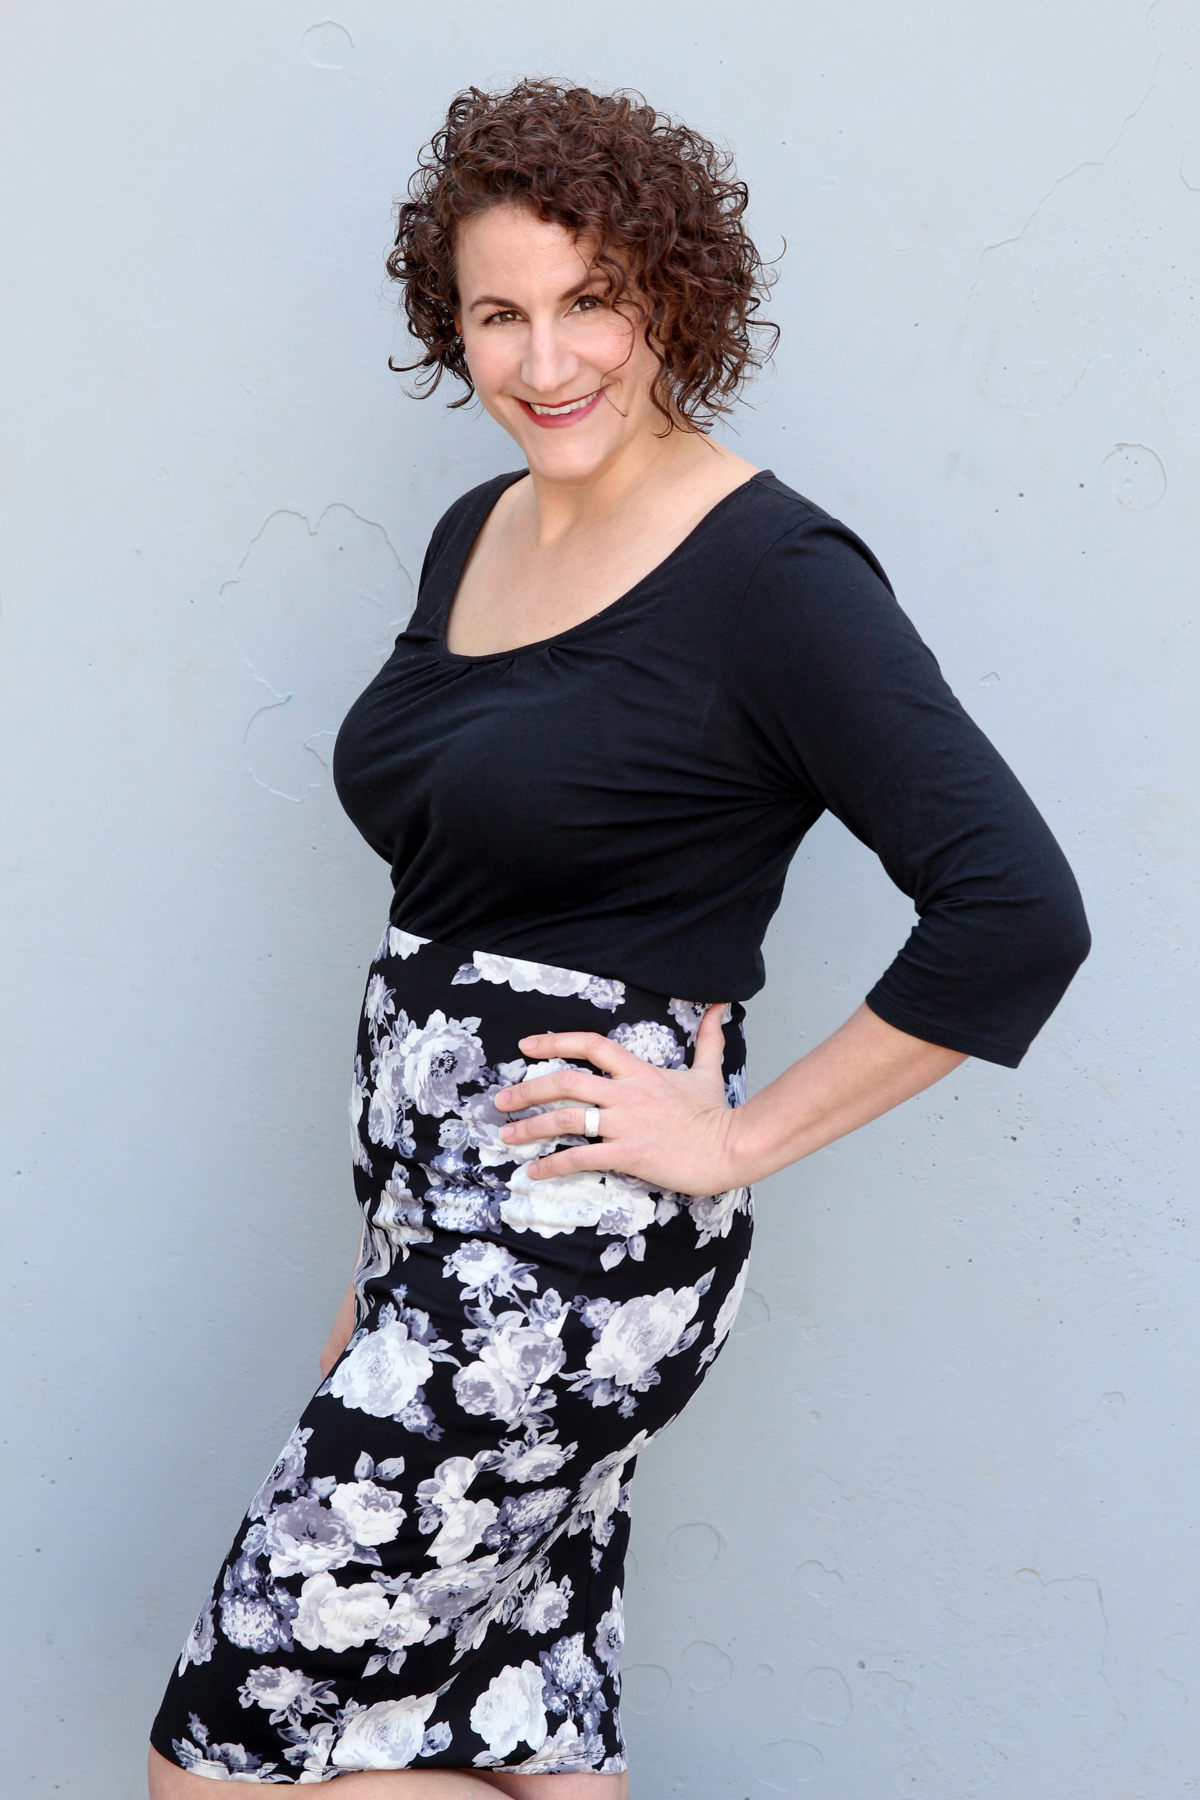 Wear a Floral Skirt as a neutral piece via @PagingSupermom